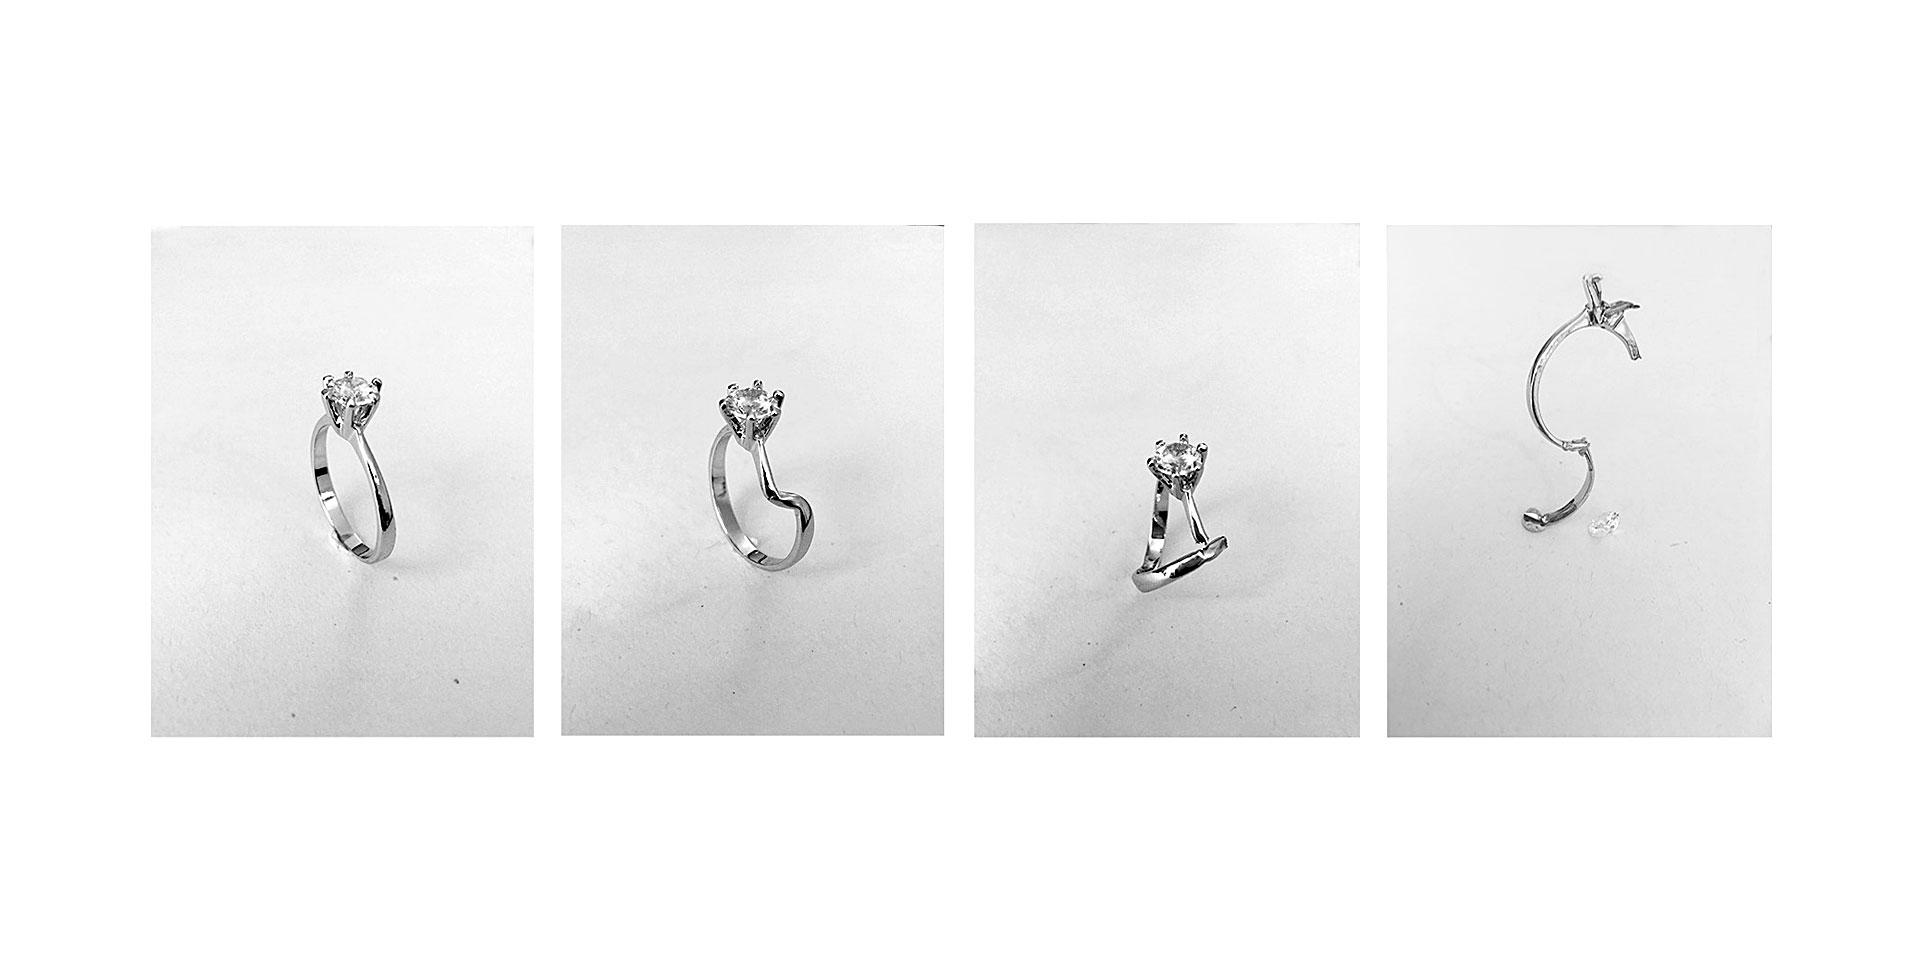 Zak Sheinman rings